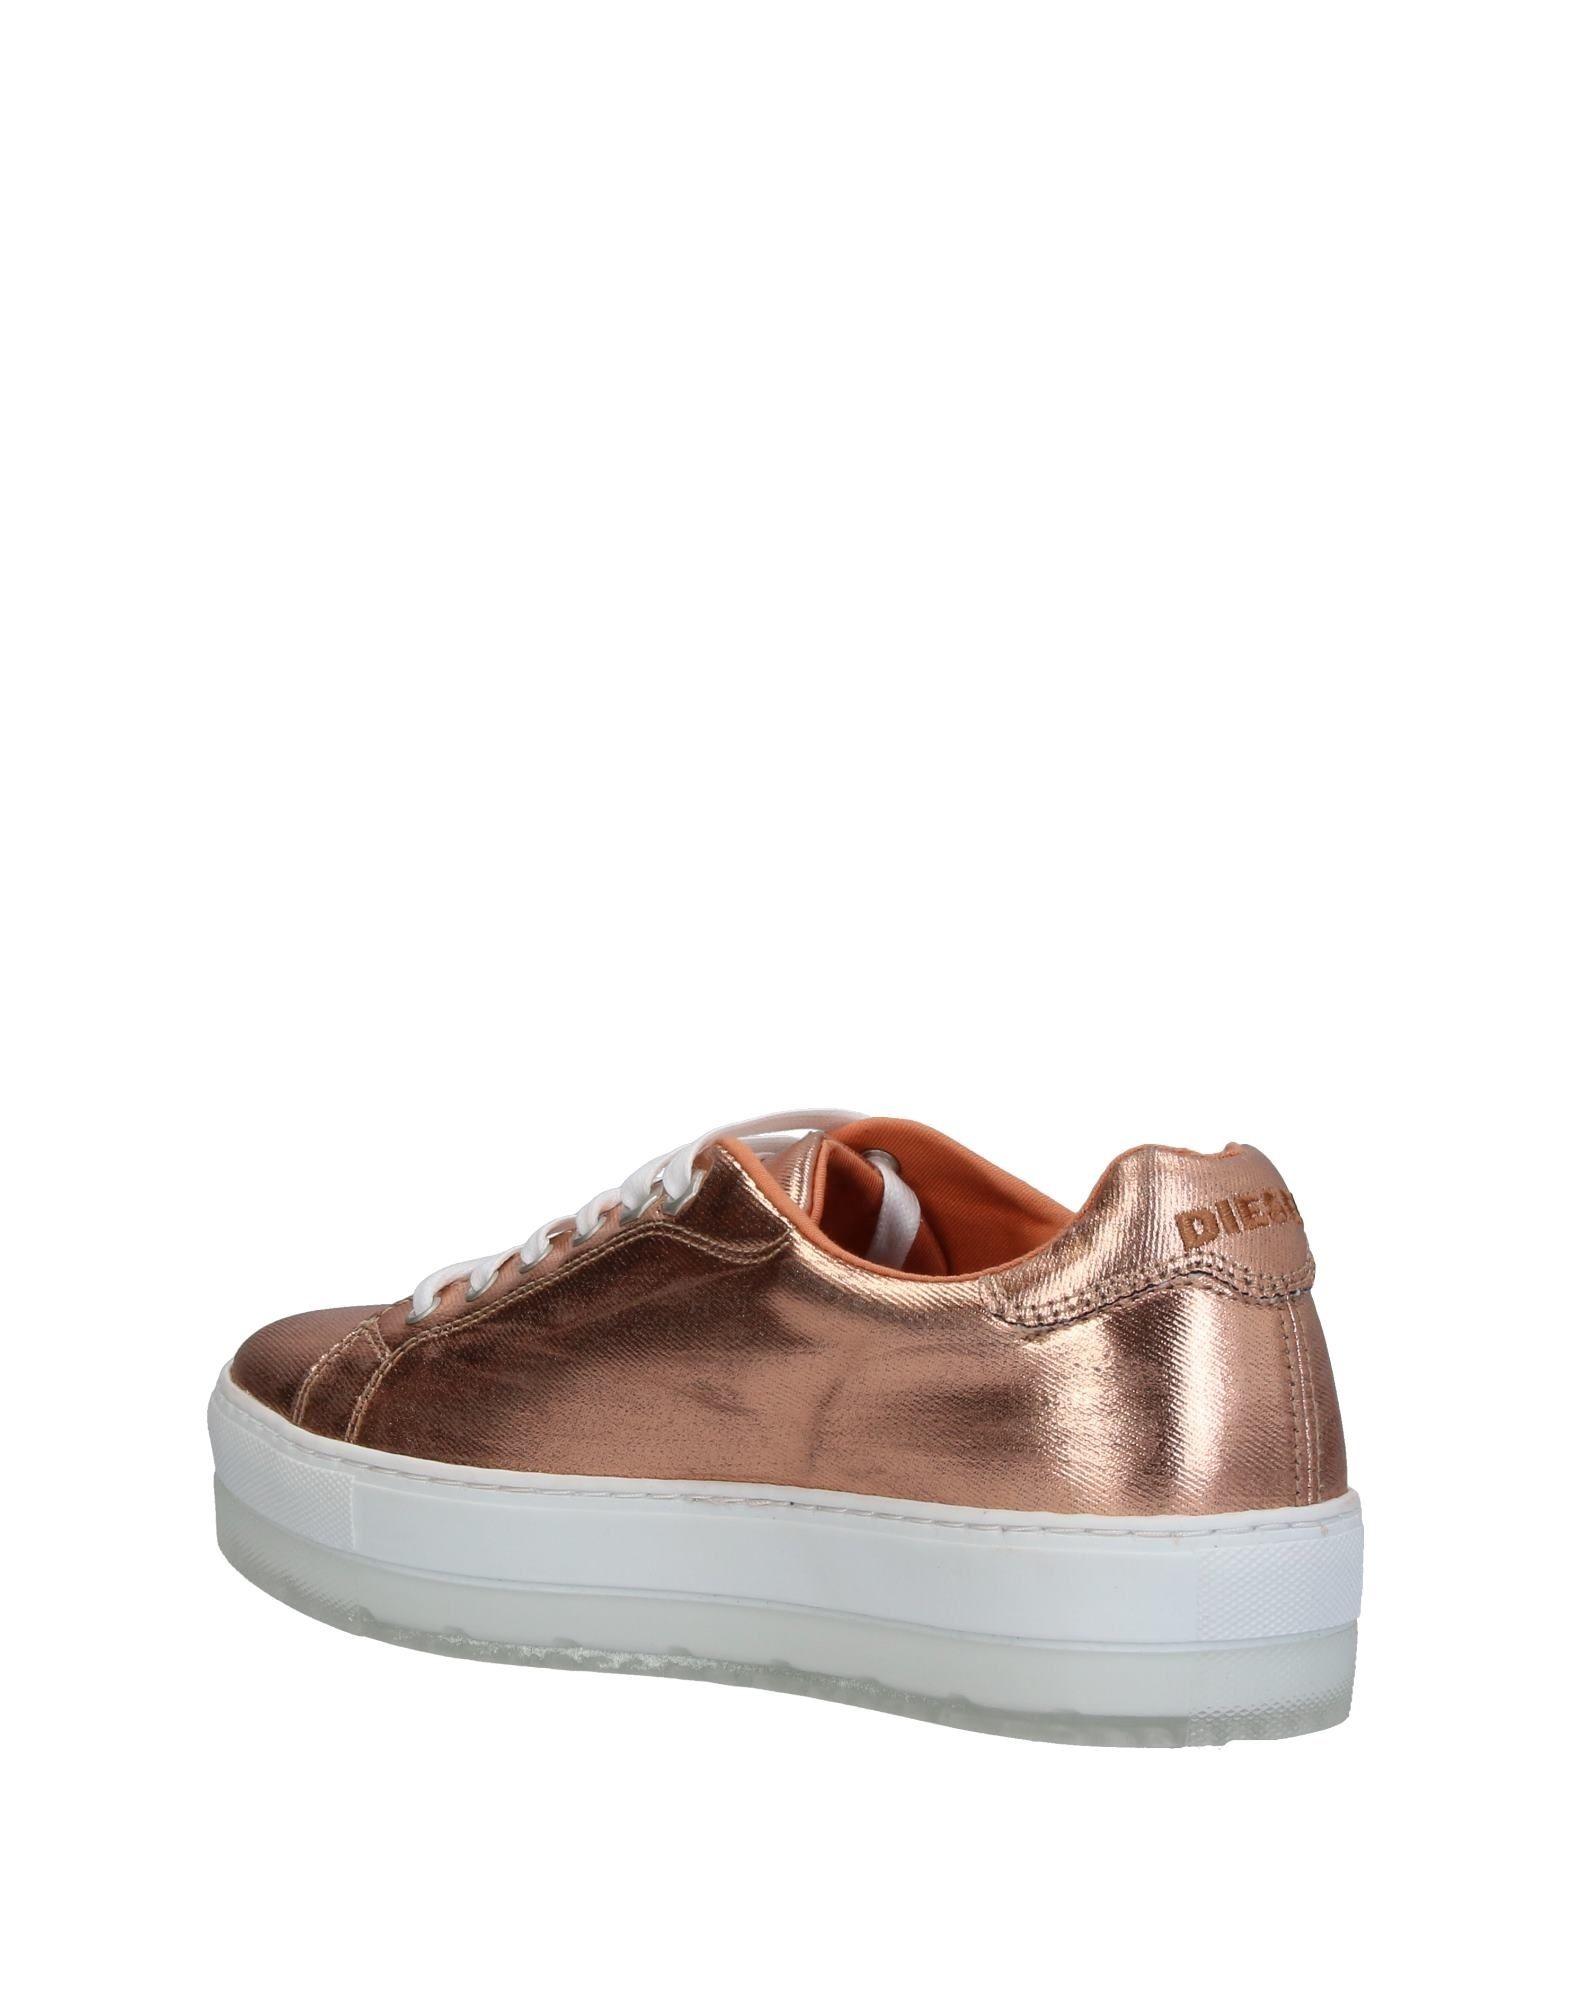 Diesel Sneakers Damen  Schuhe 11413767WM Gute Qualität beliebte Schuhe  0dee41